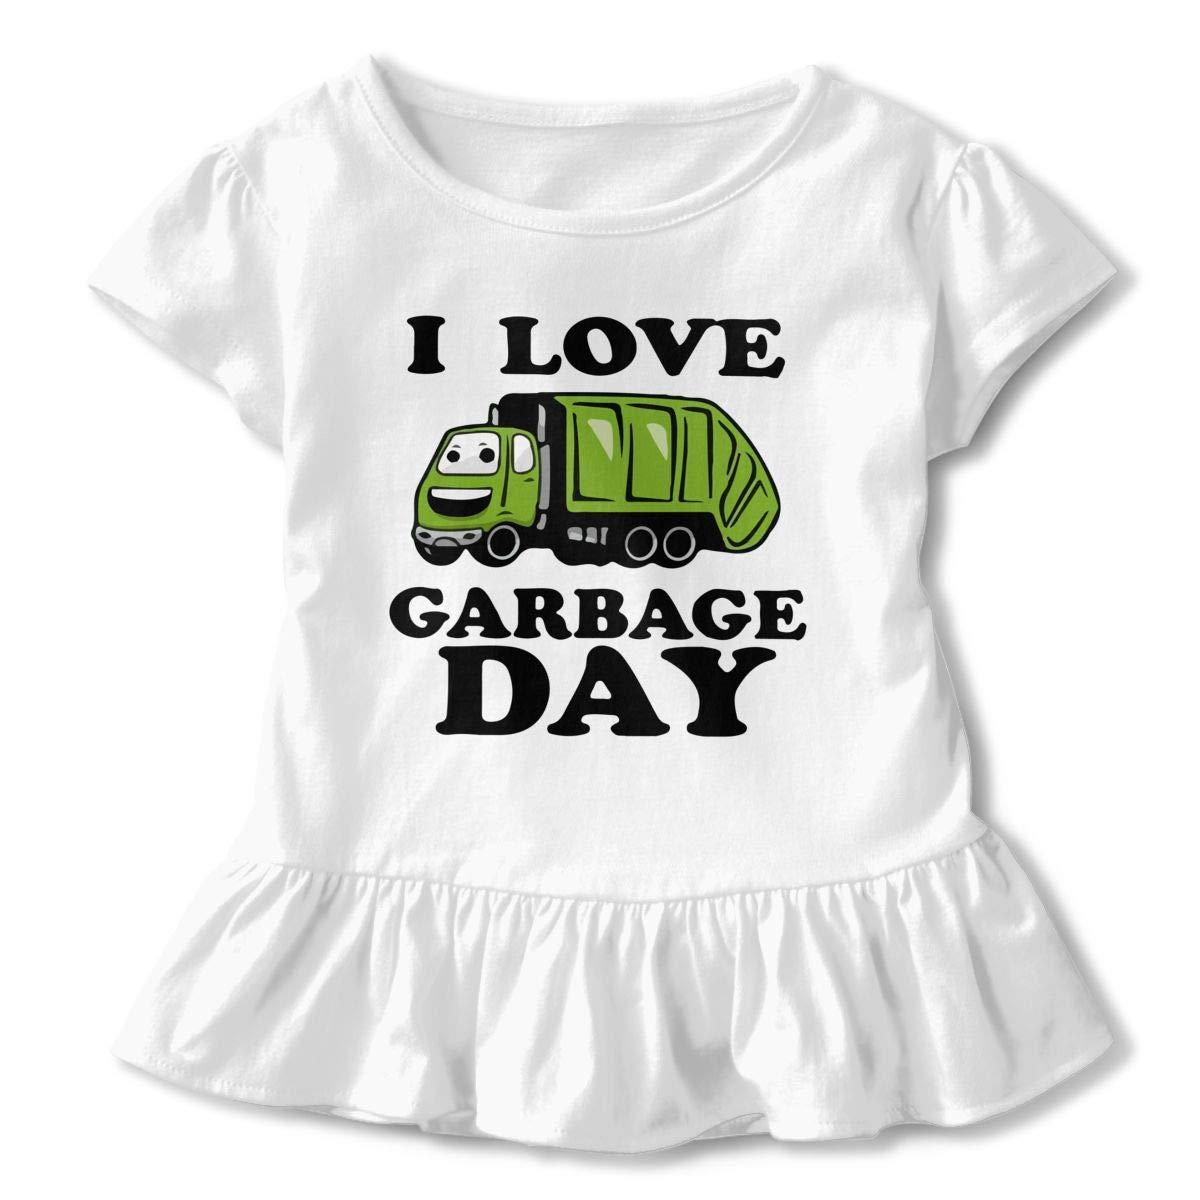 I Heart Love Trash Garbage Trucks Baby Girls Round Collar Shirt Top/&Tee